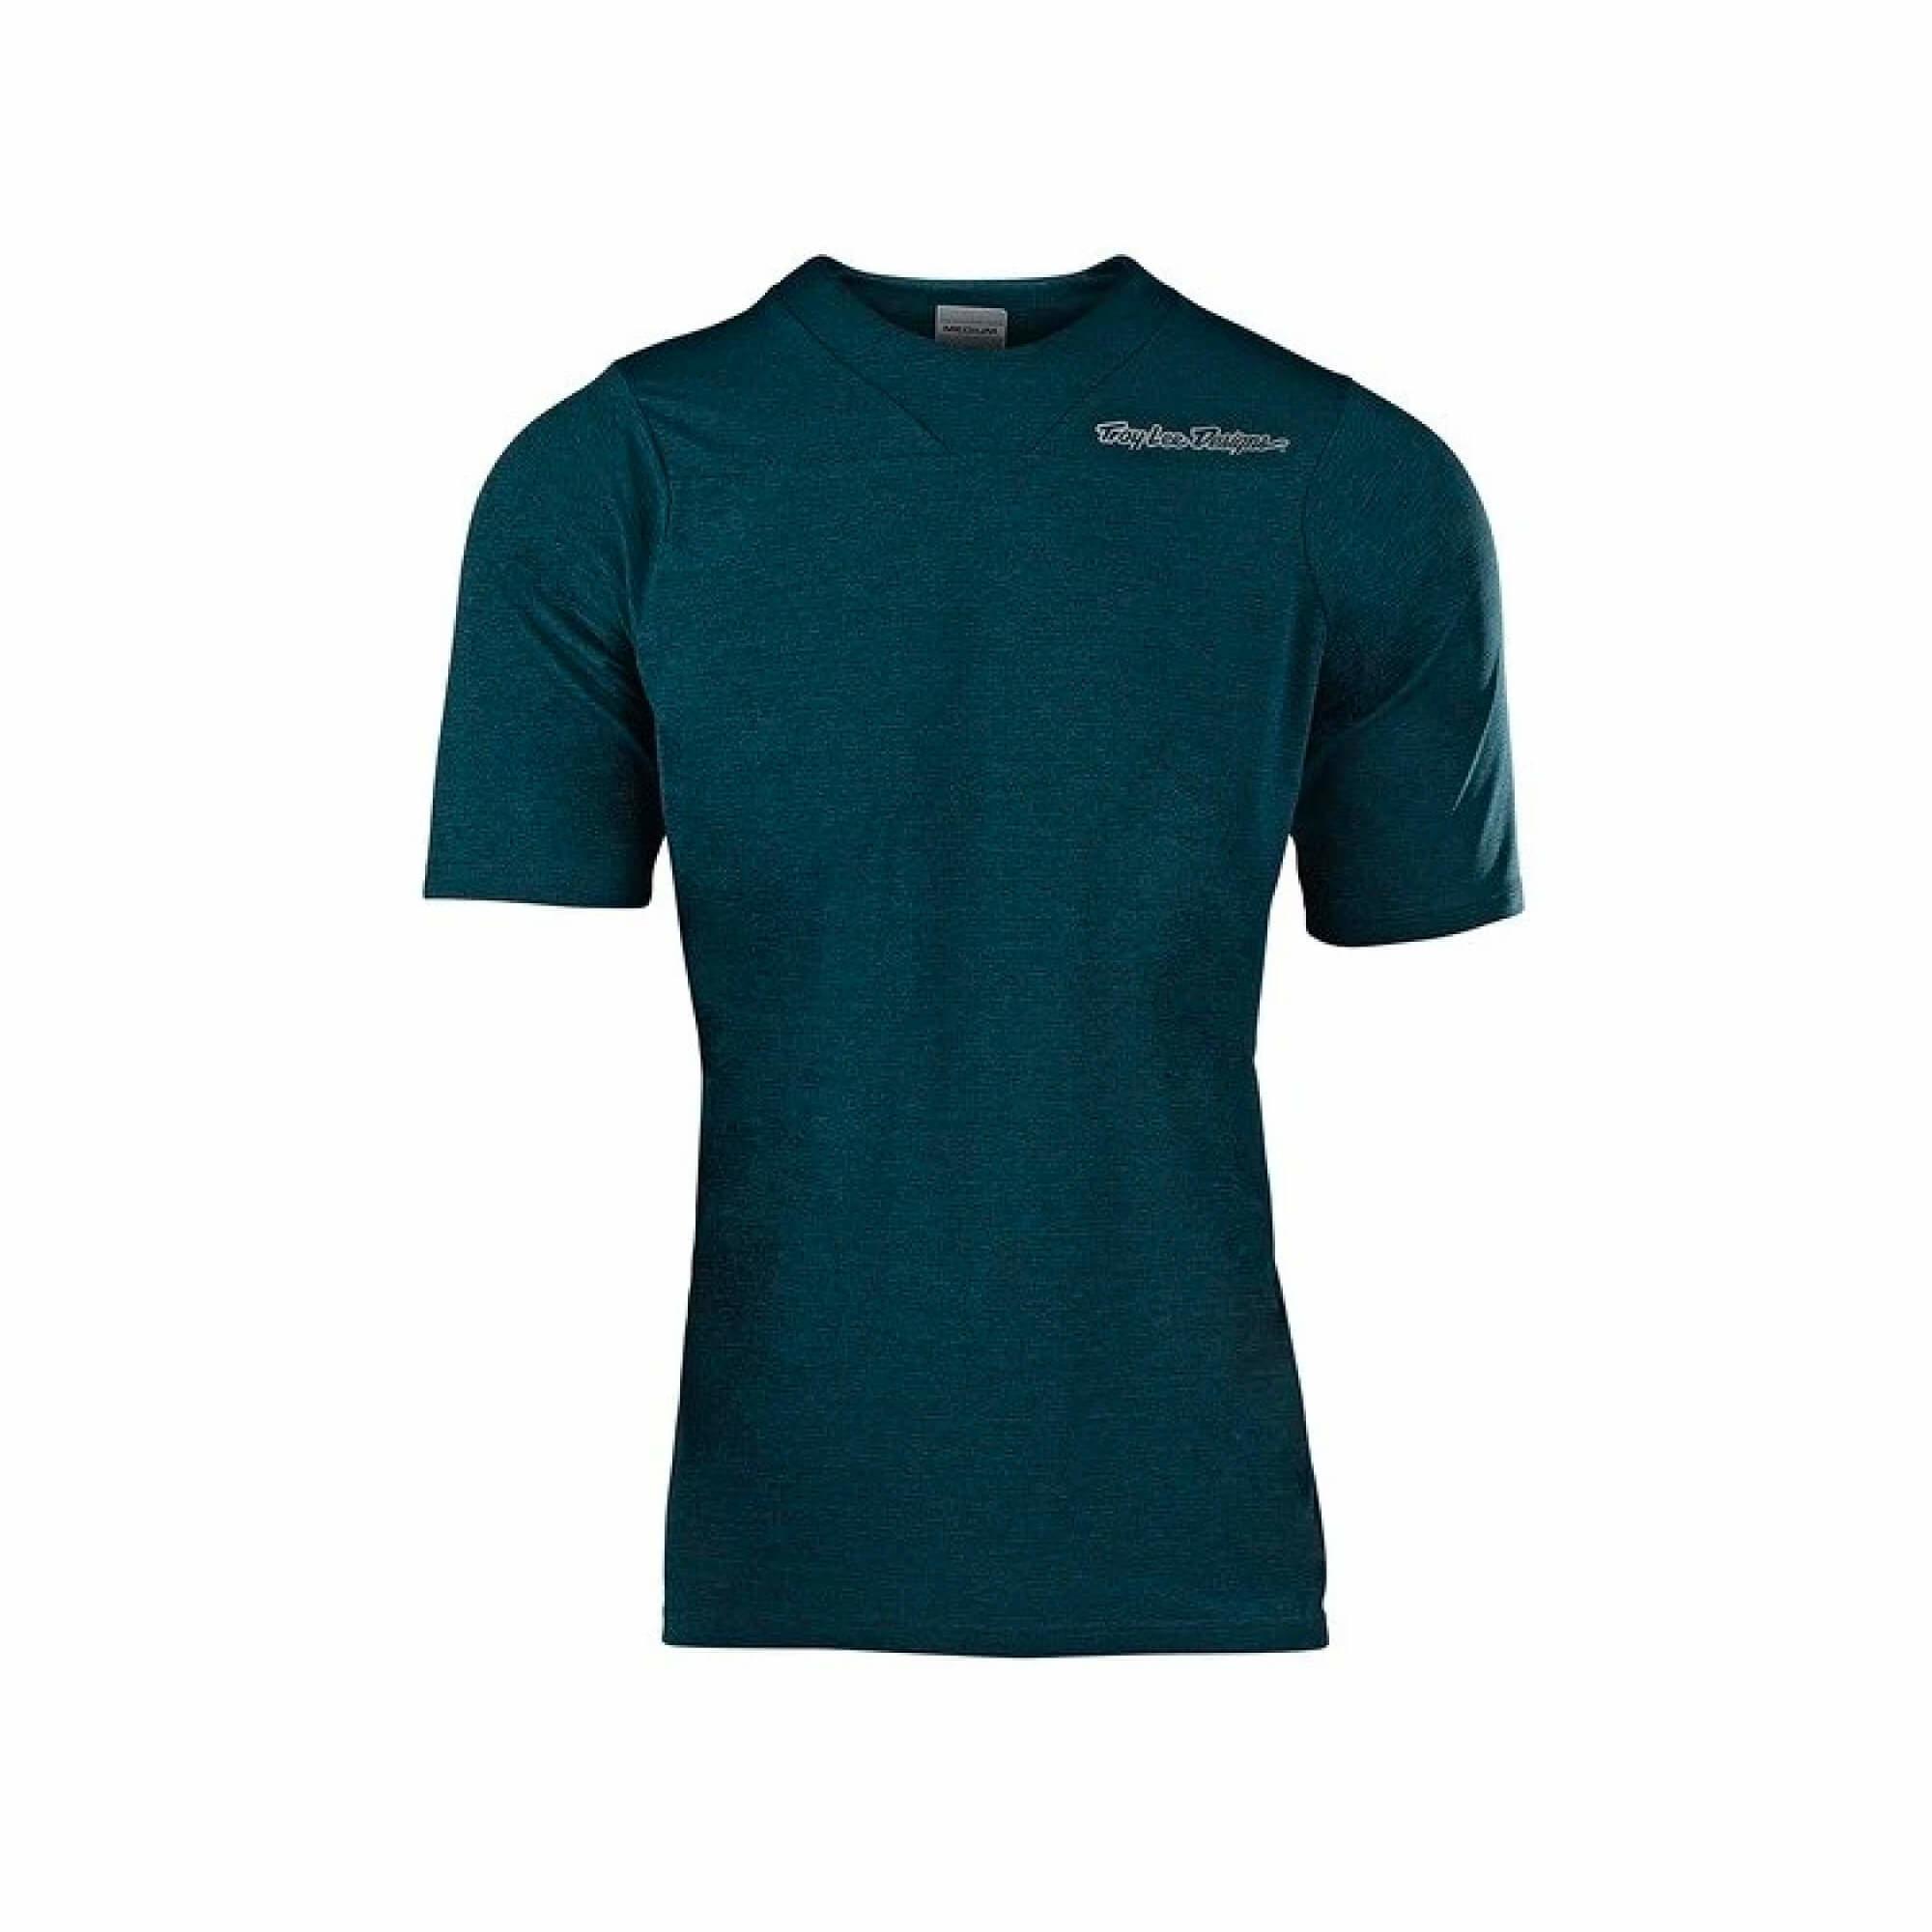 Skyline Short Sleeve Jersey HTR 20-3